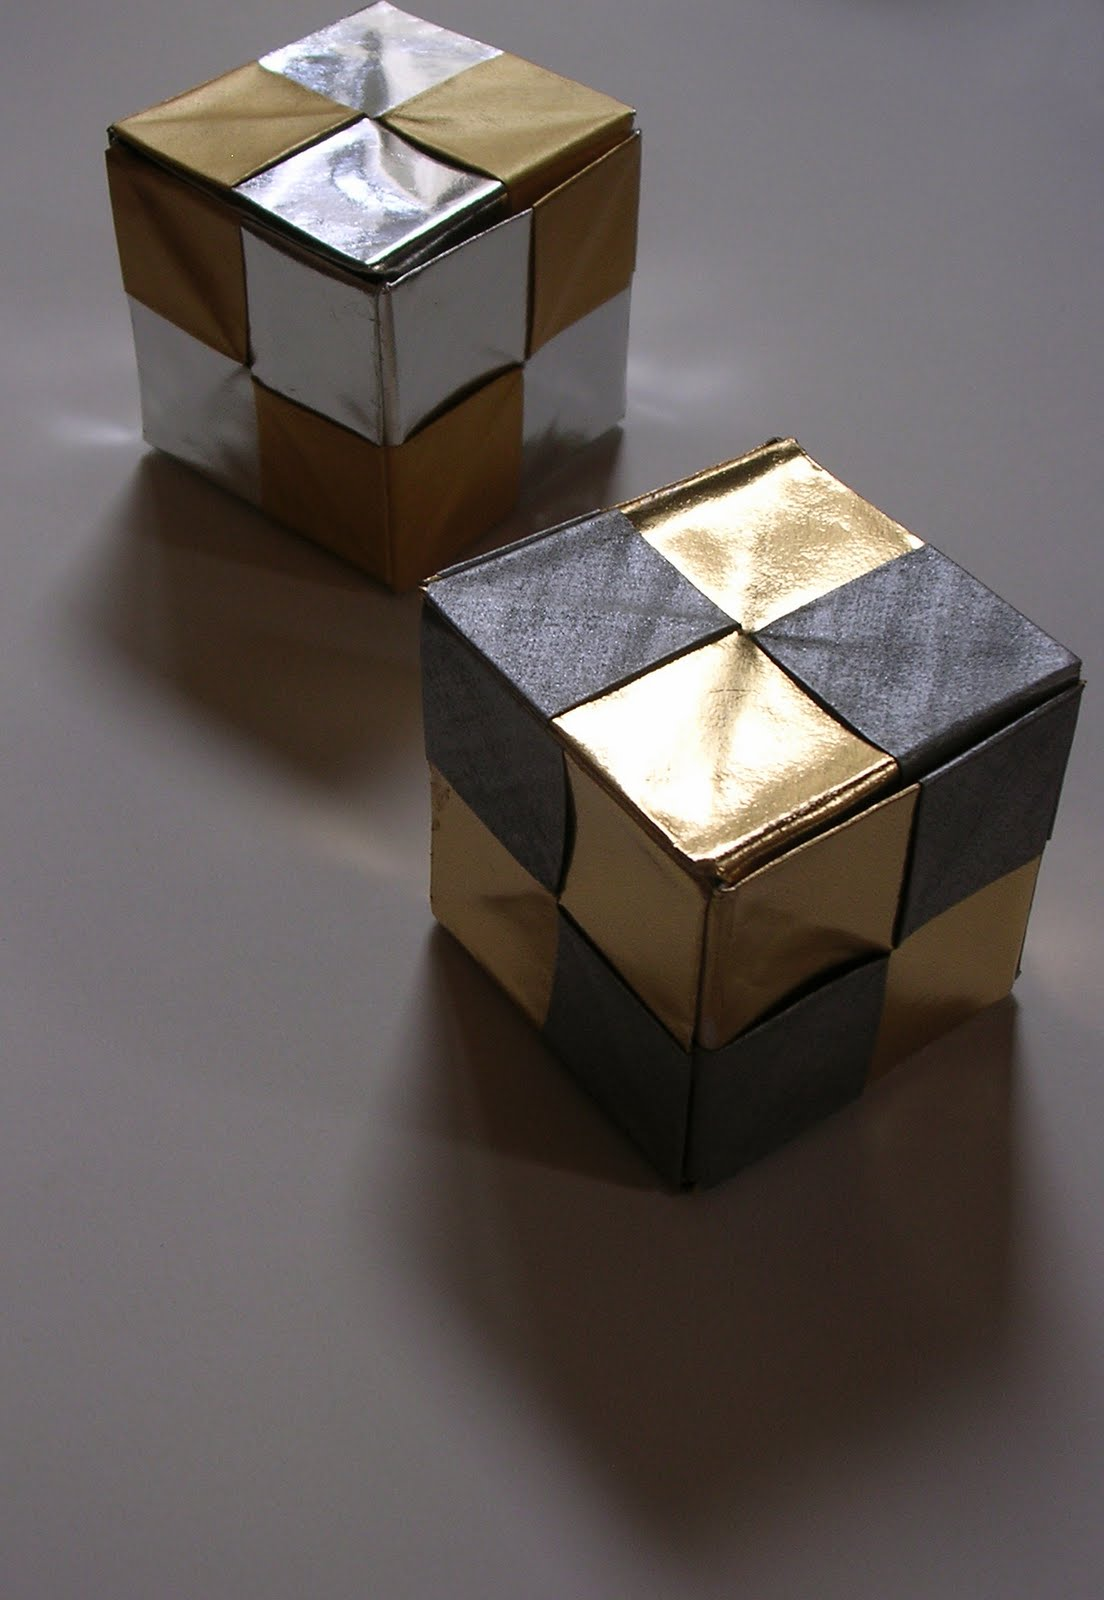 Dice Cube Box Kunihiko Kasahara Origami Omnibus Origami Constructions